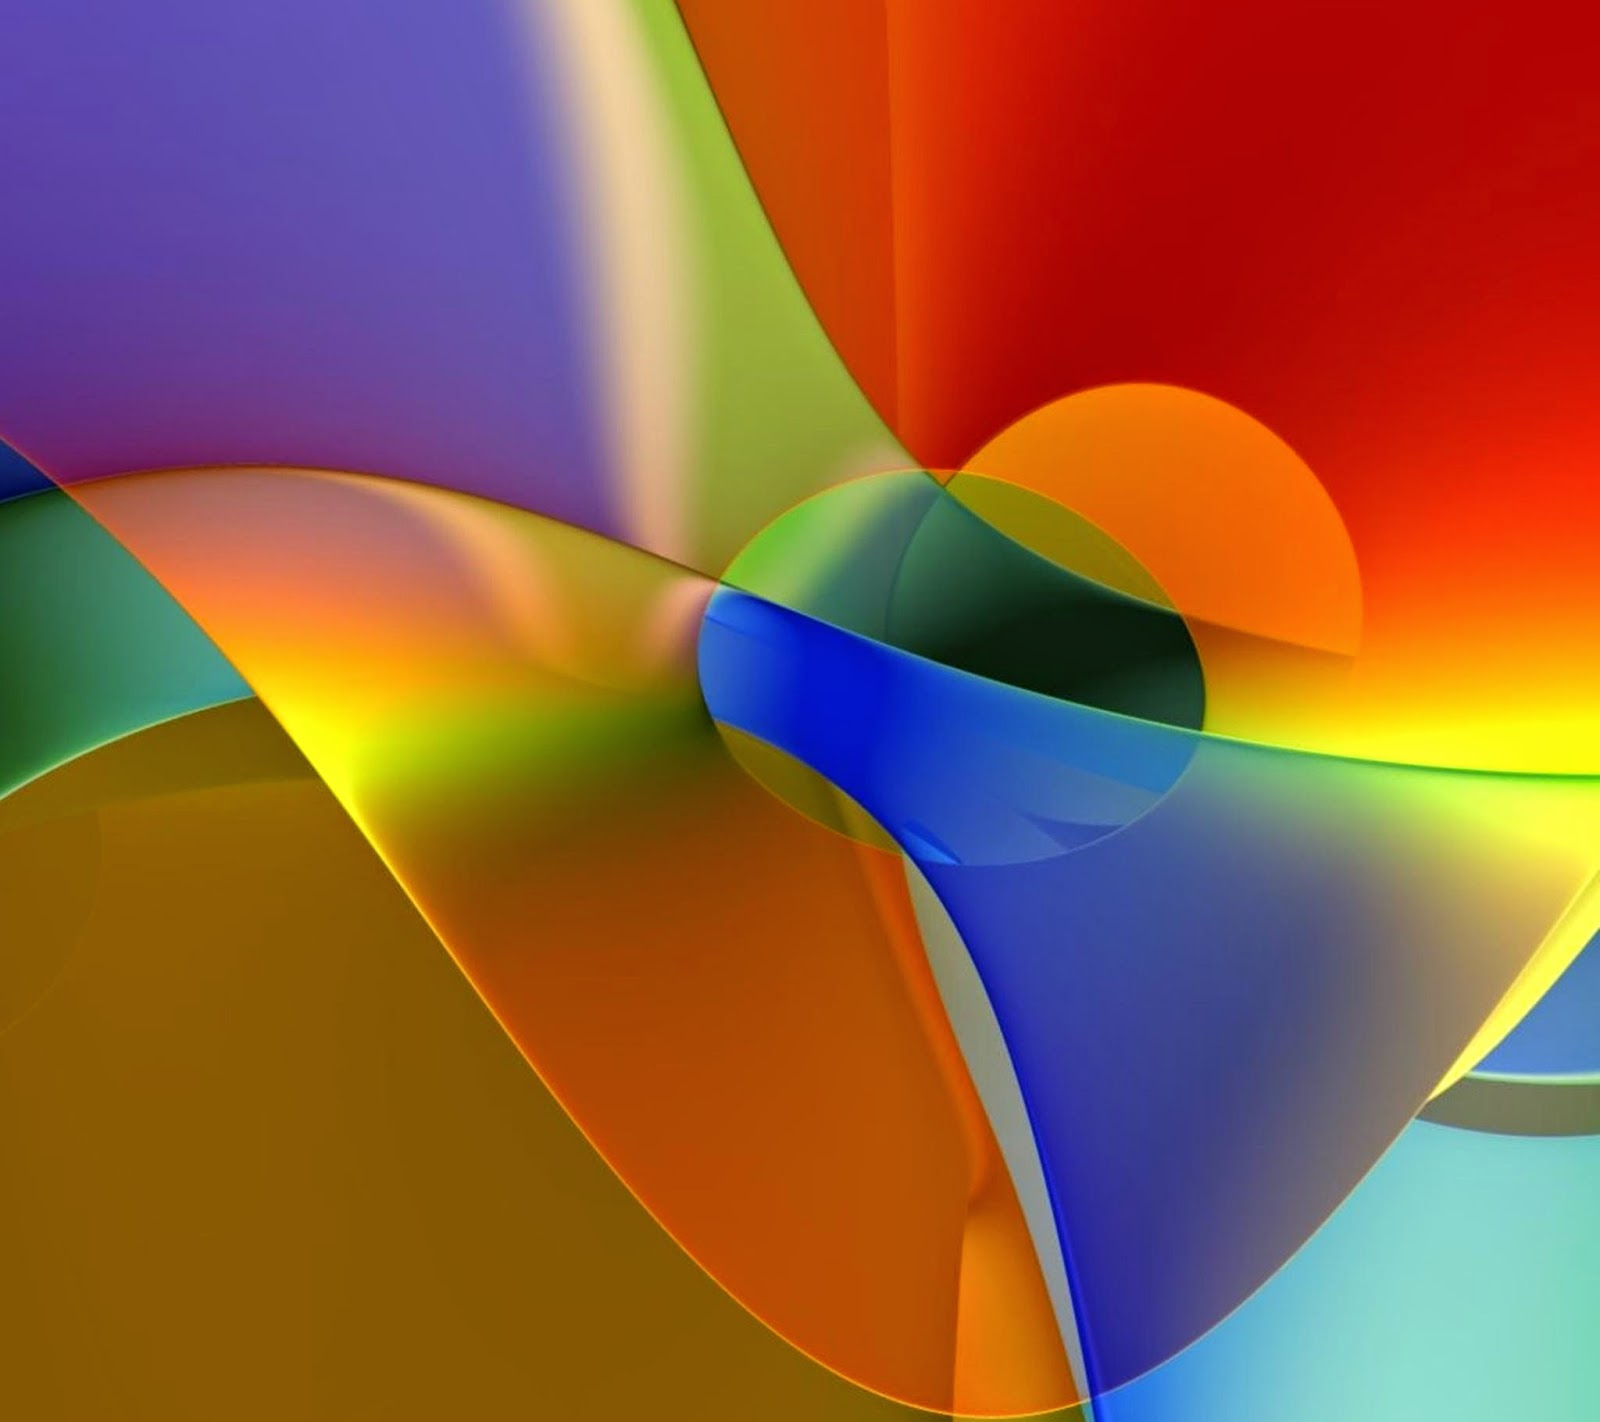 Beautiful Samsung Wallpaper Hd 1600x1422 Download Hd Wallpaper Wallpapertip